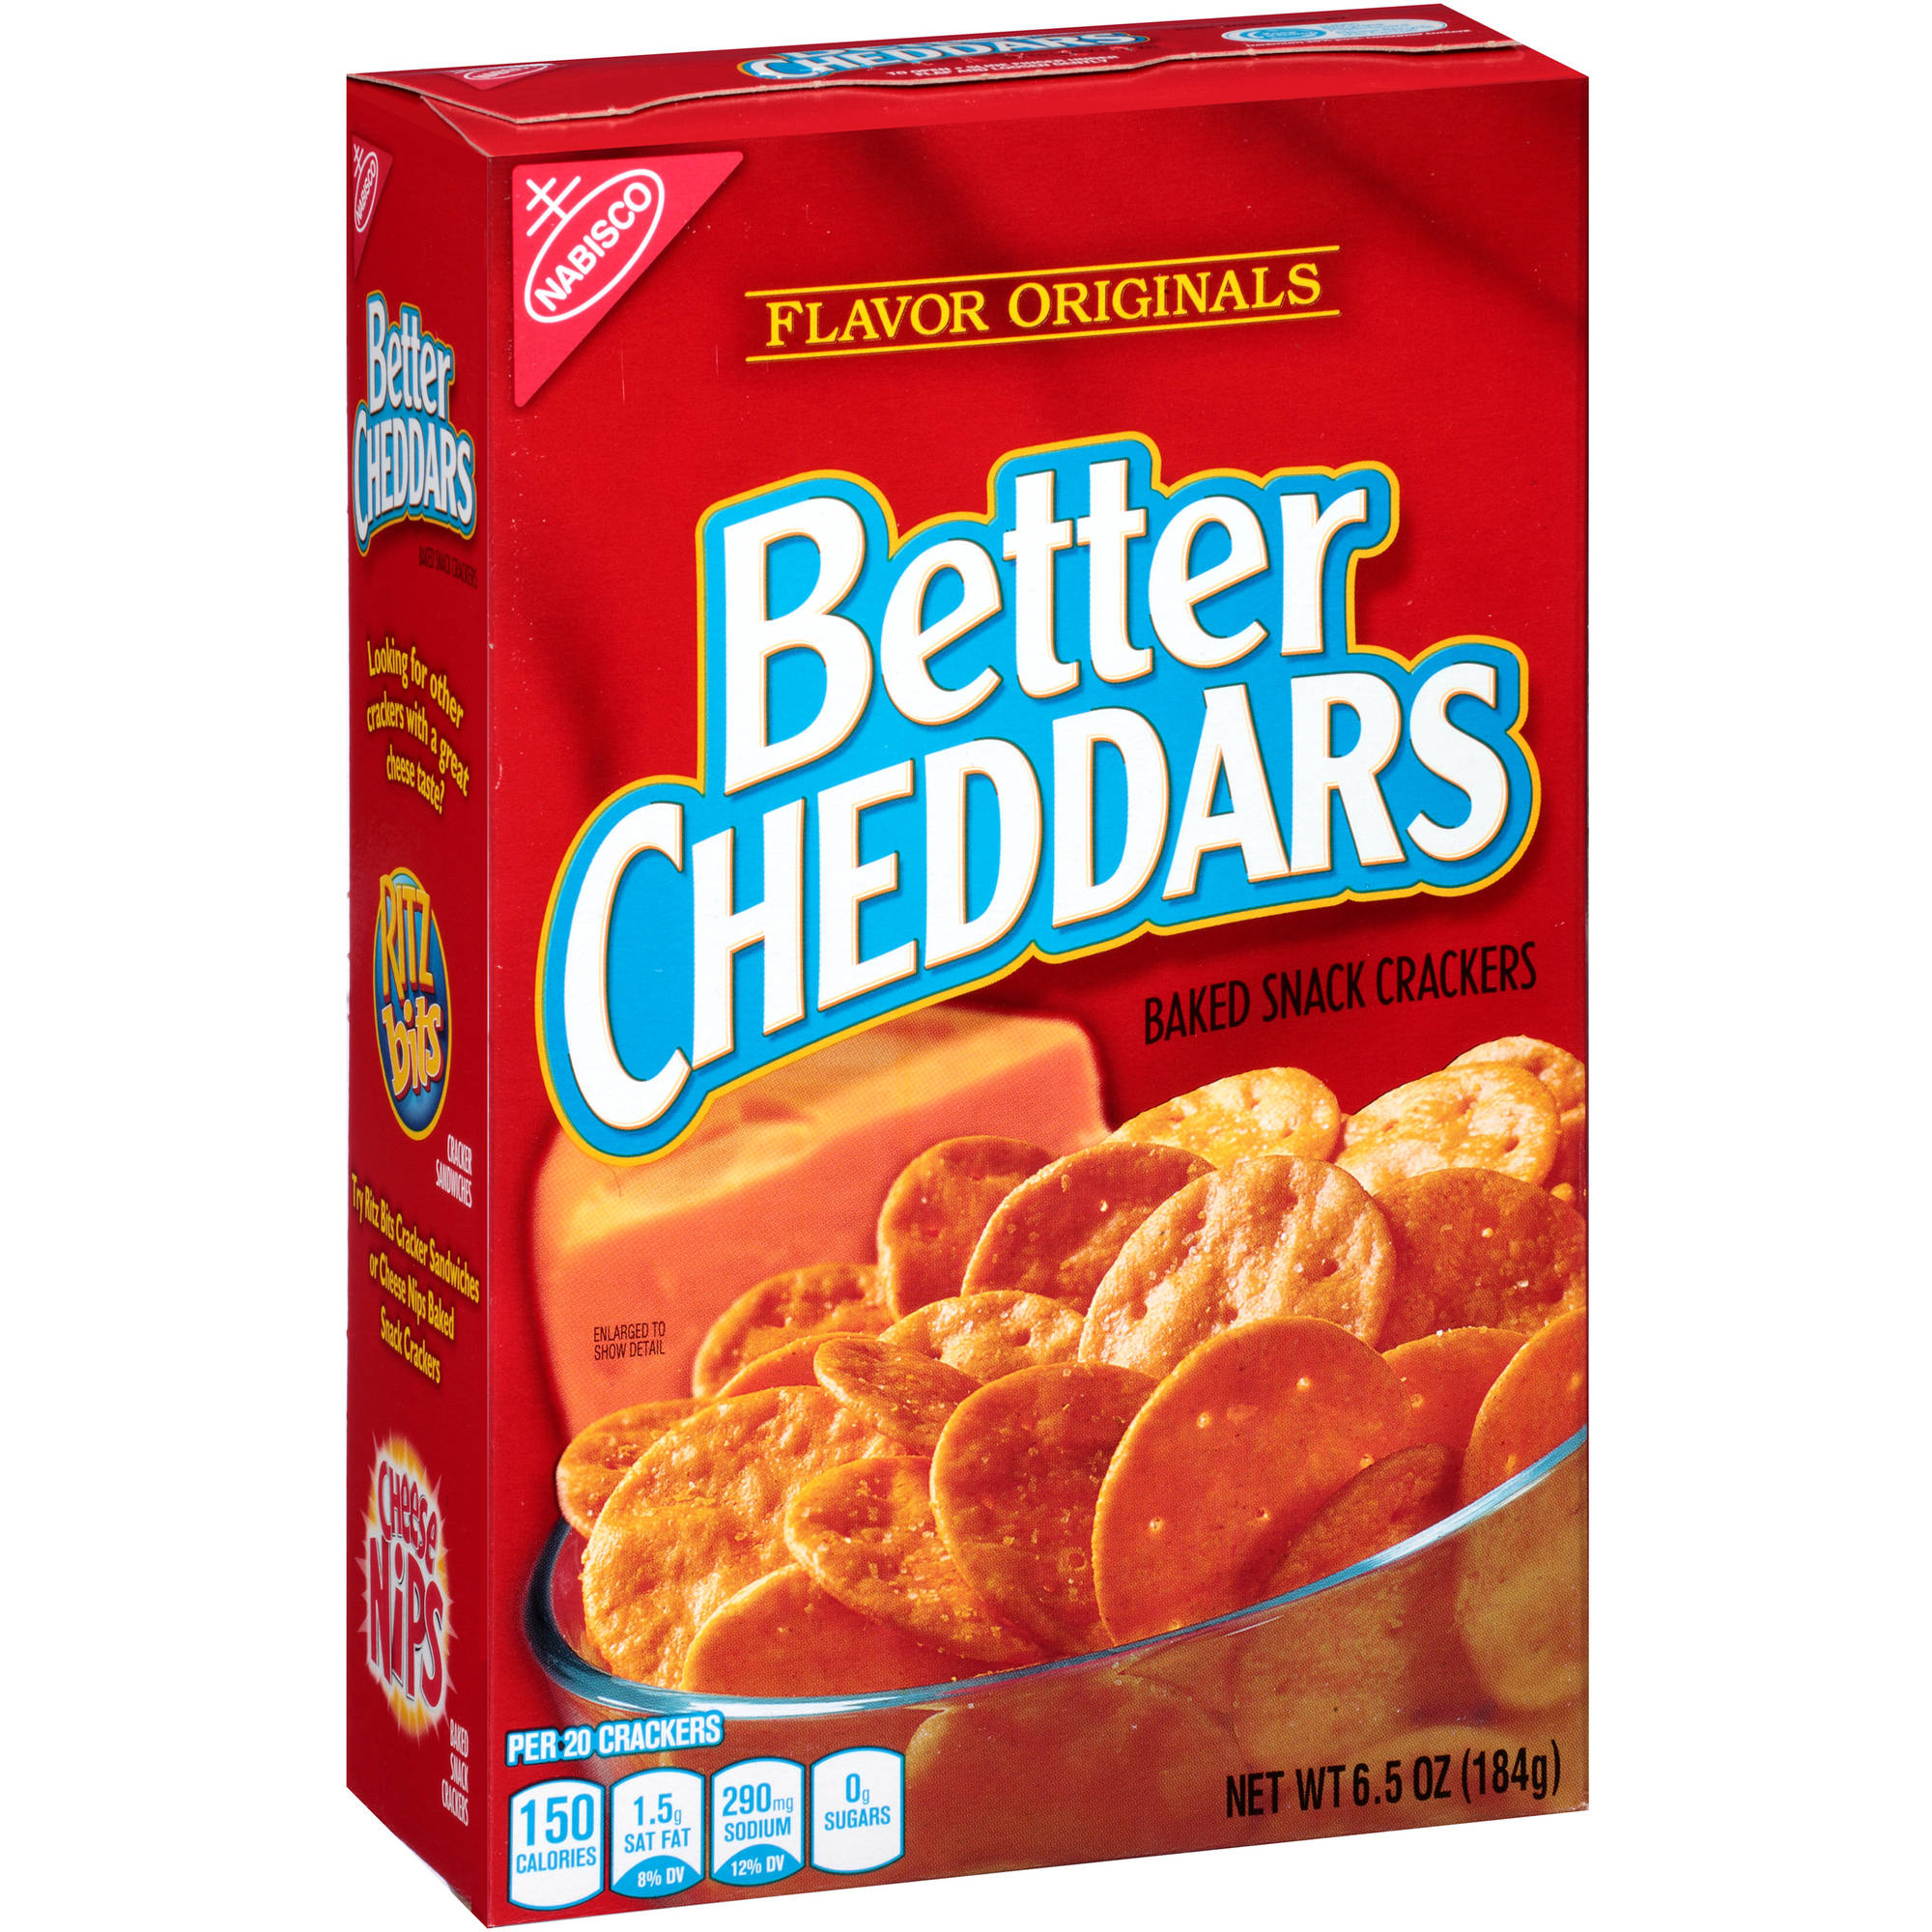 Nabisco Flavor Originals Better Cheddars Baked Snack Crackers, 6.5